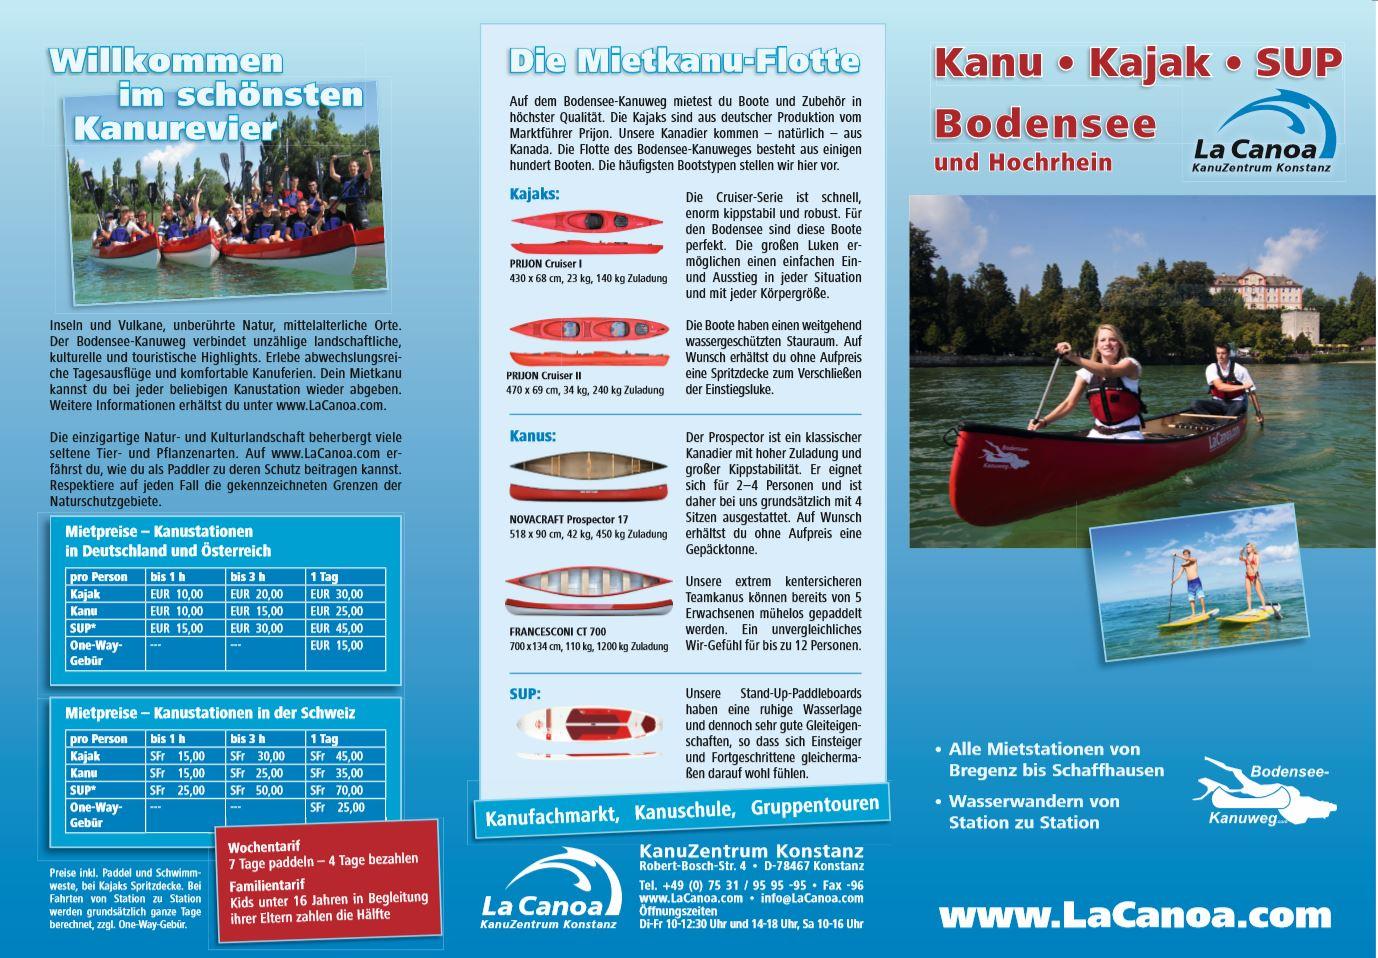 Informationen Preise Kanus Kajaks und SUPs Bodensee-Kanuweg